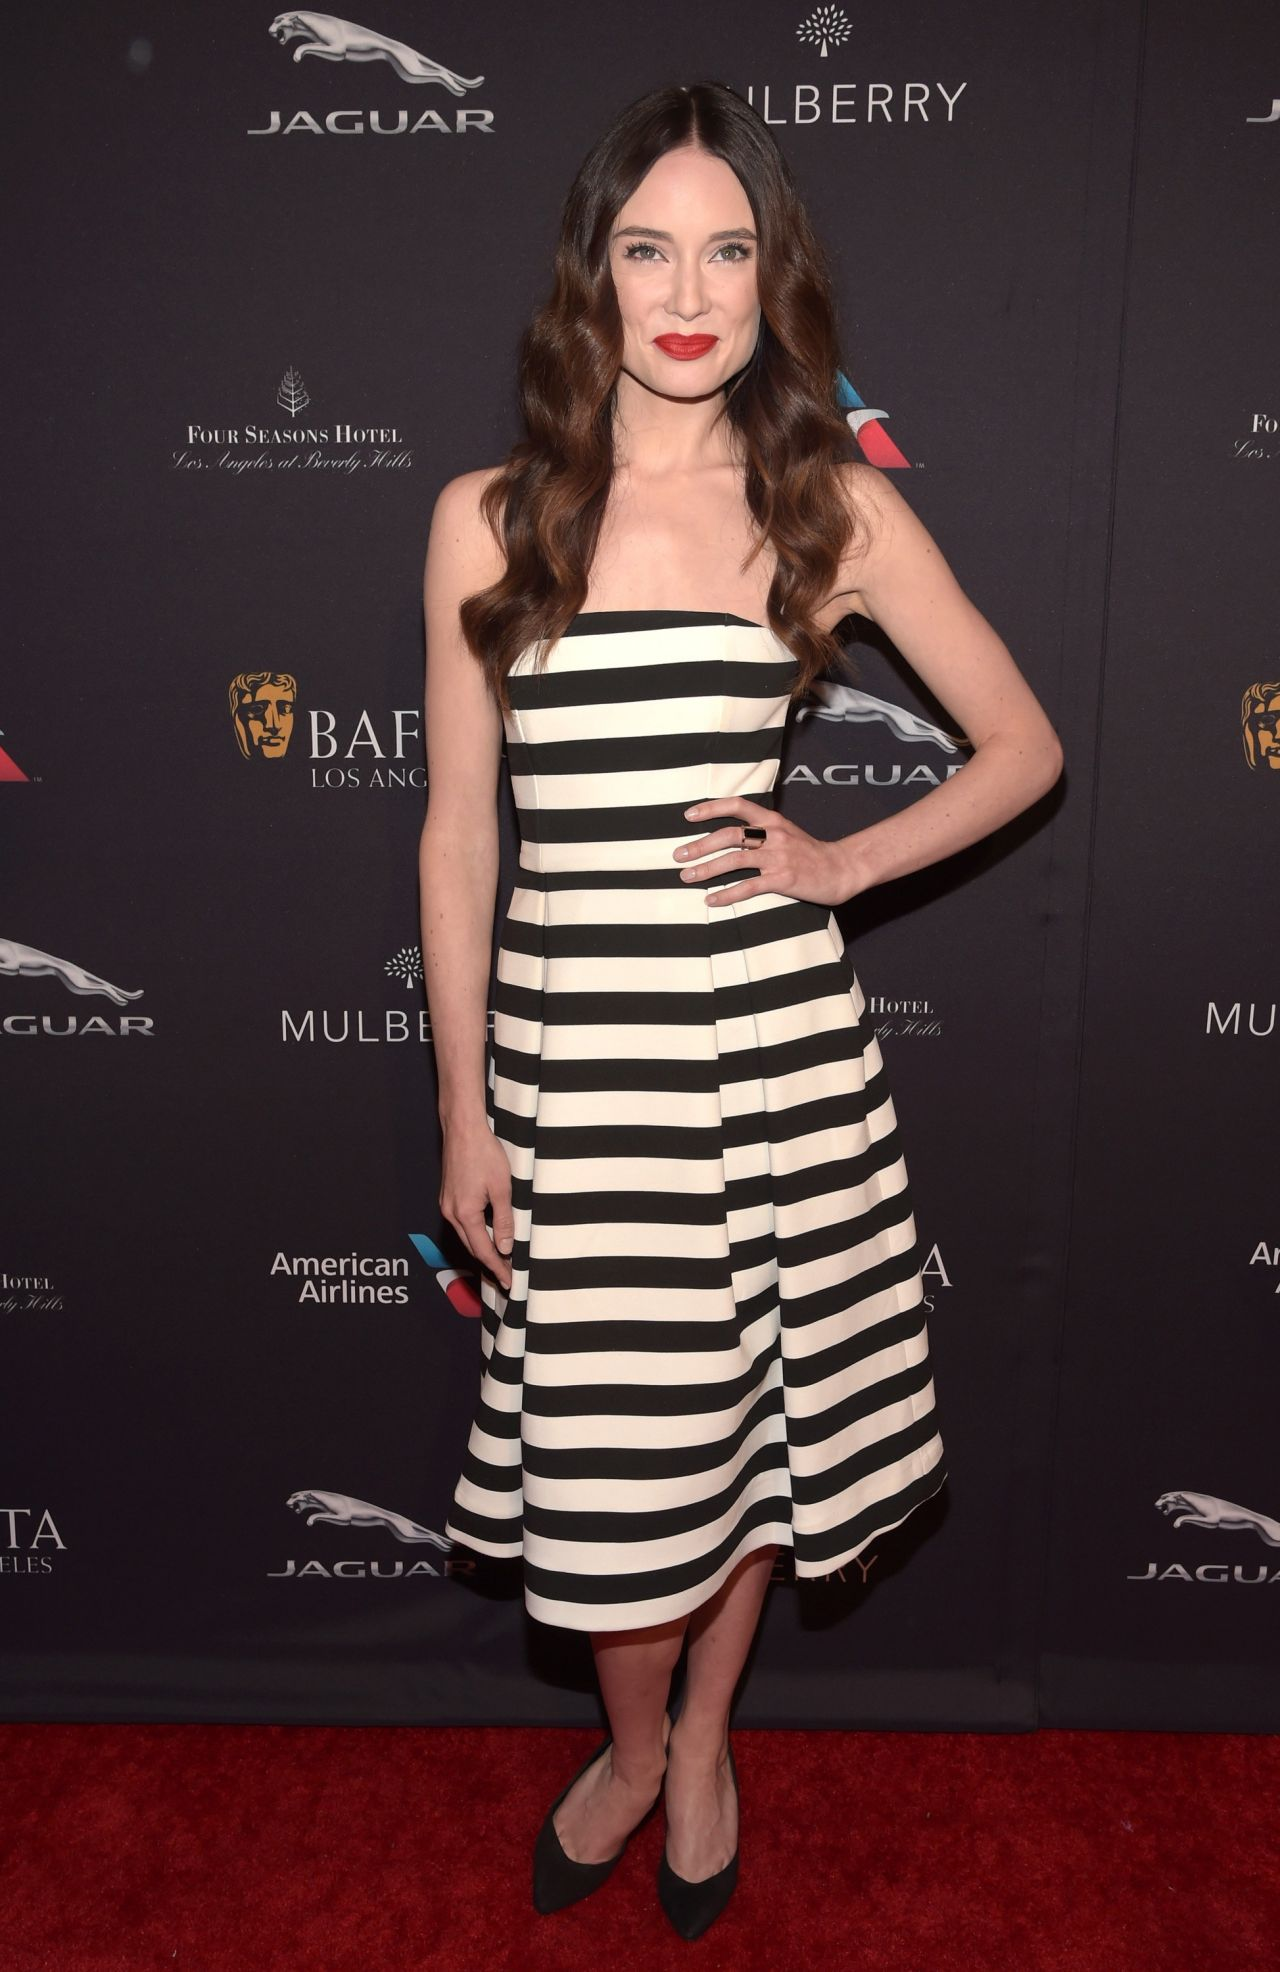 Mallory Jansen 2015 Lingerie BAFTA Los Angeles Tea Party